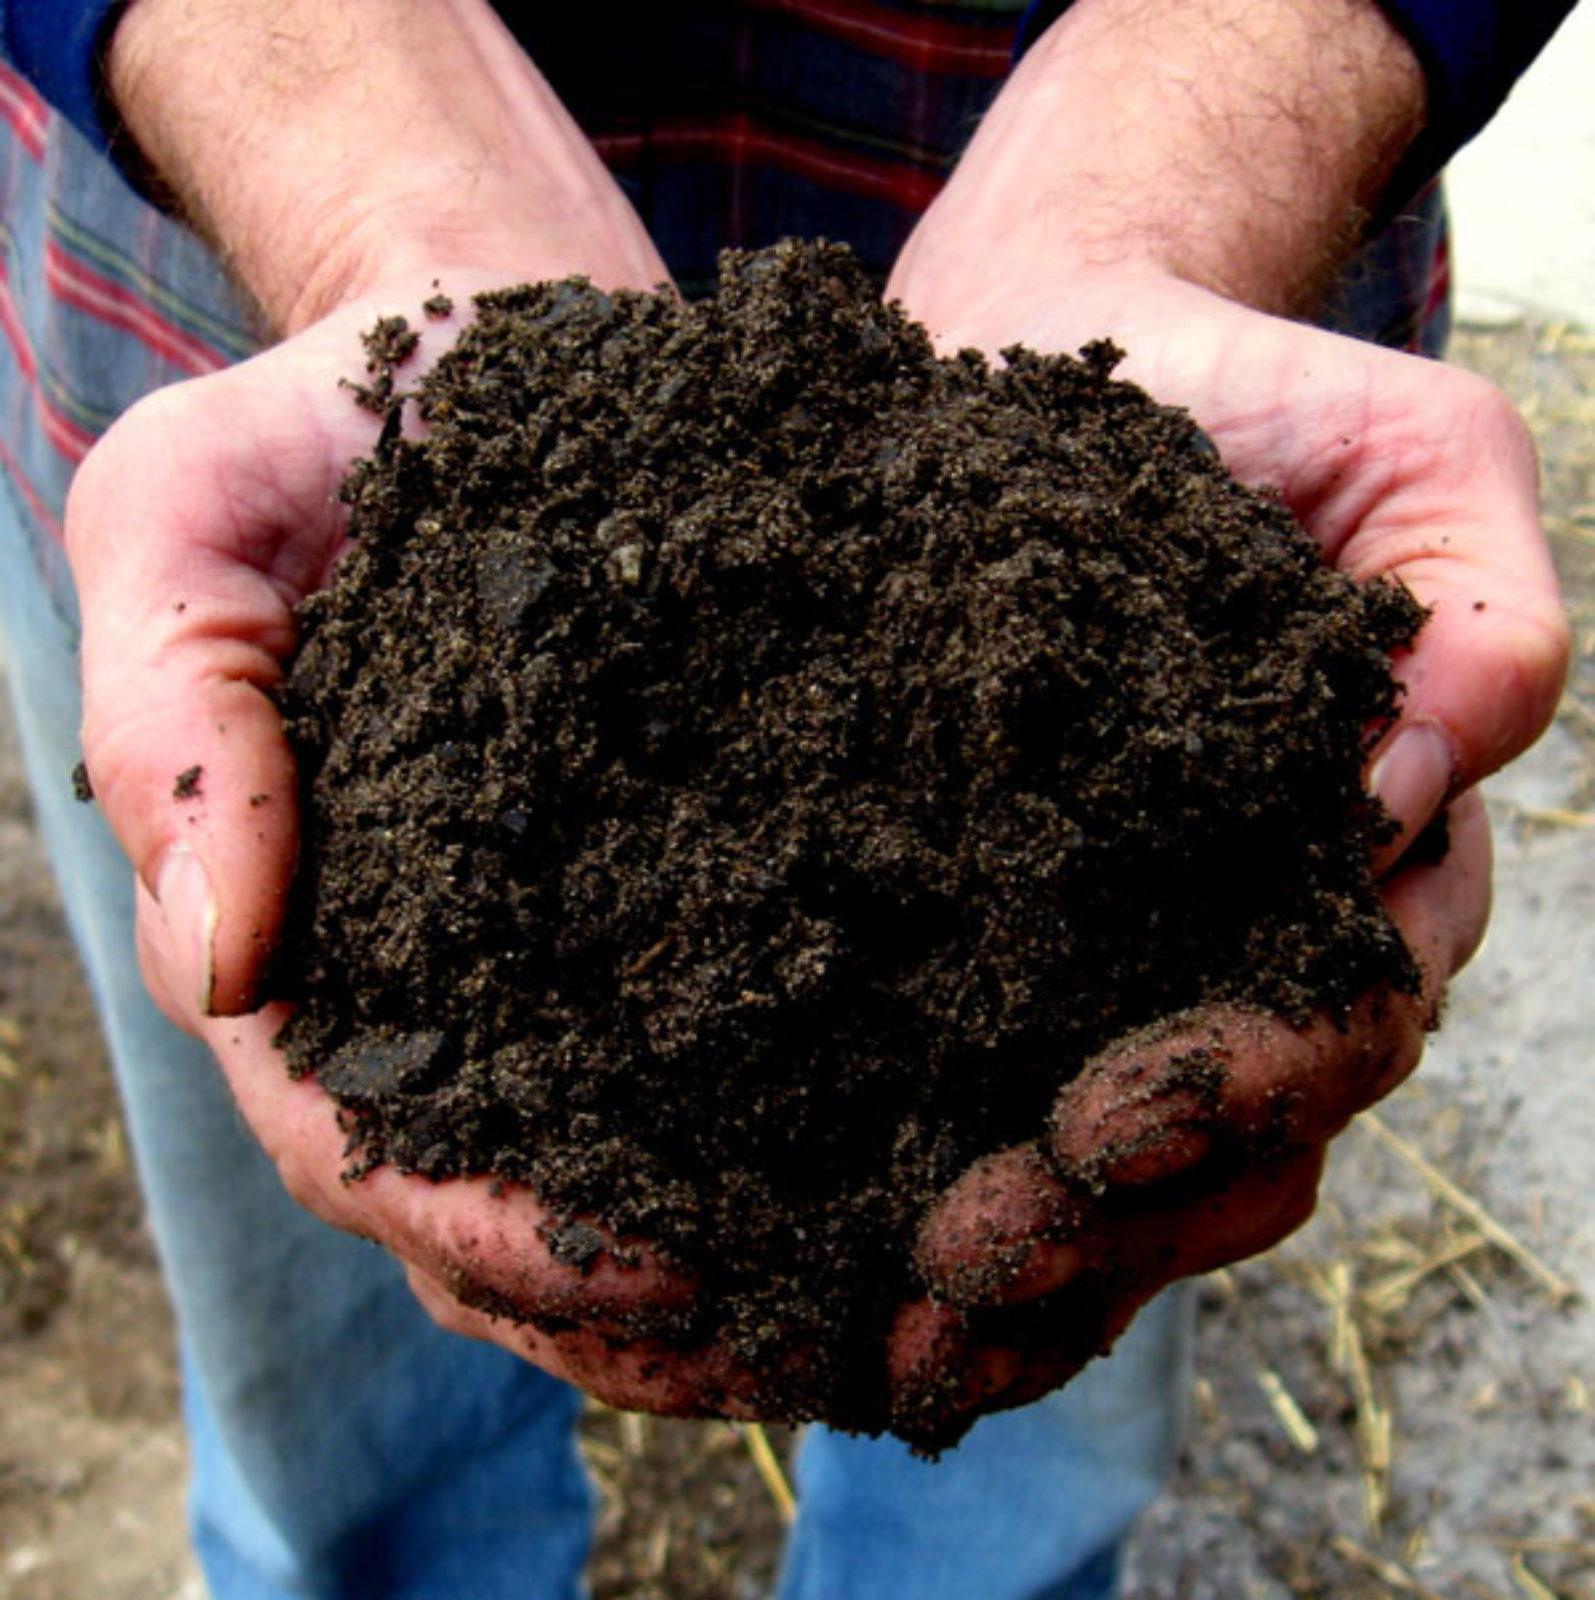 Gardeners Delight - Soil, Kalamazoo, Topsoil, Renewed Earth, Garden, Yard